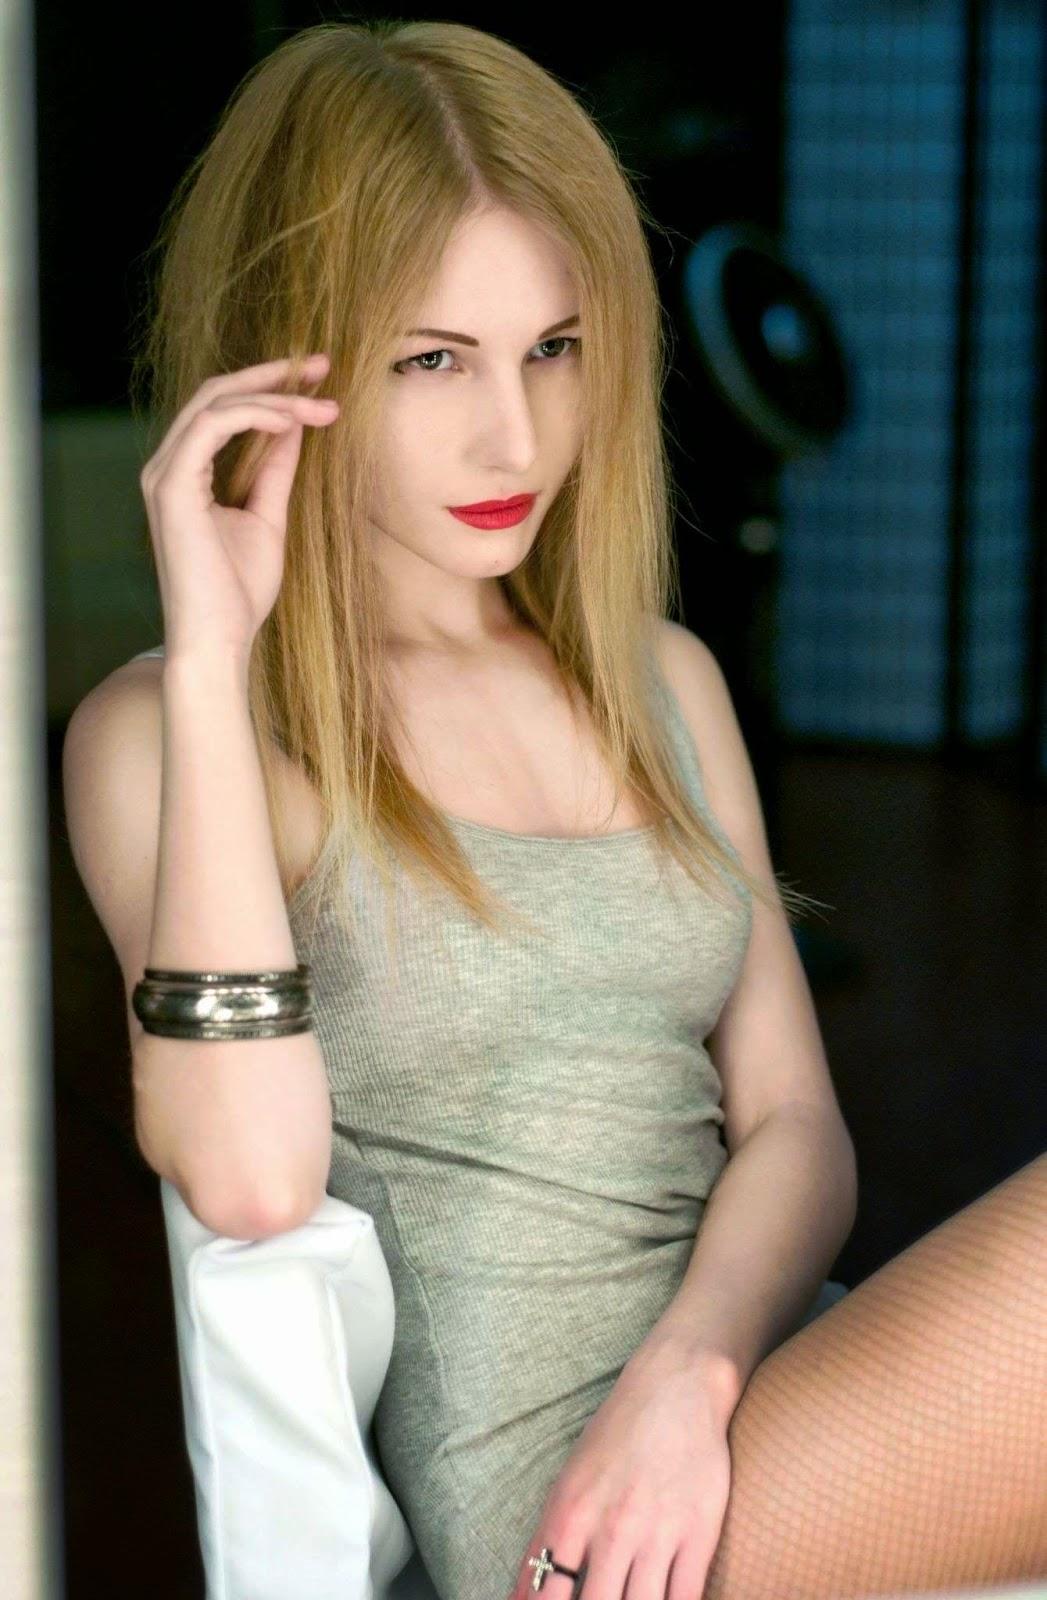 Elena chica rusa bonita y dulce - Valencia - esskokkacom